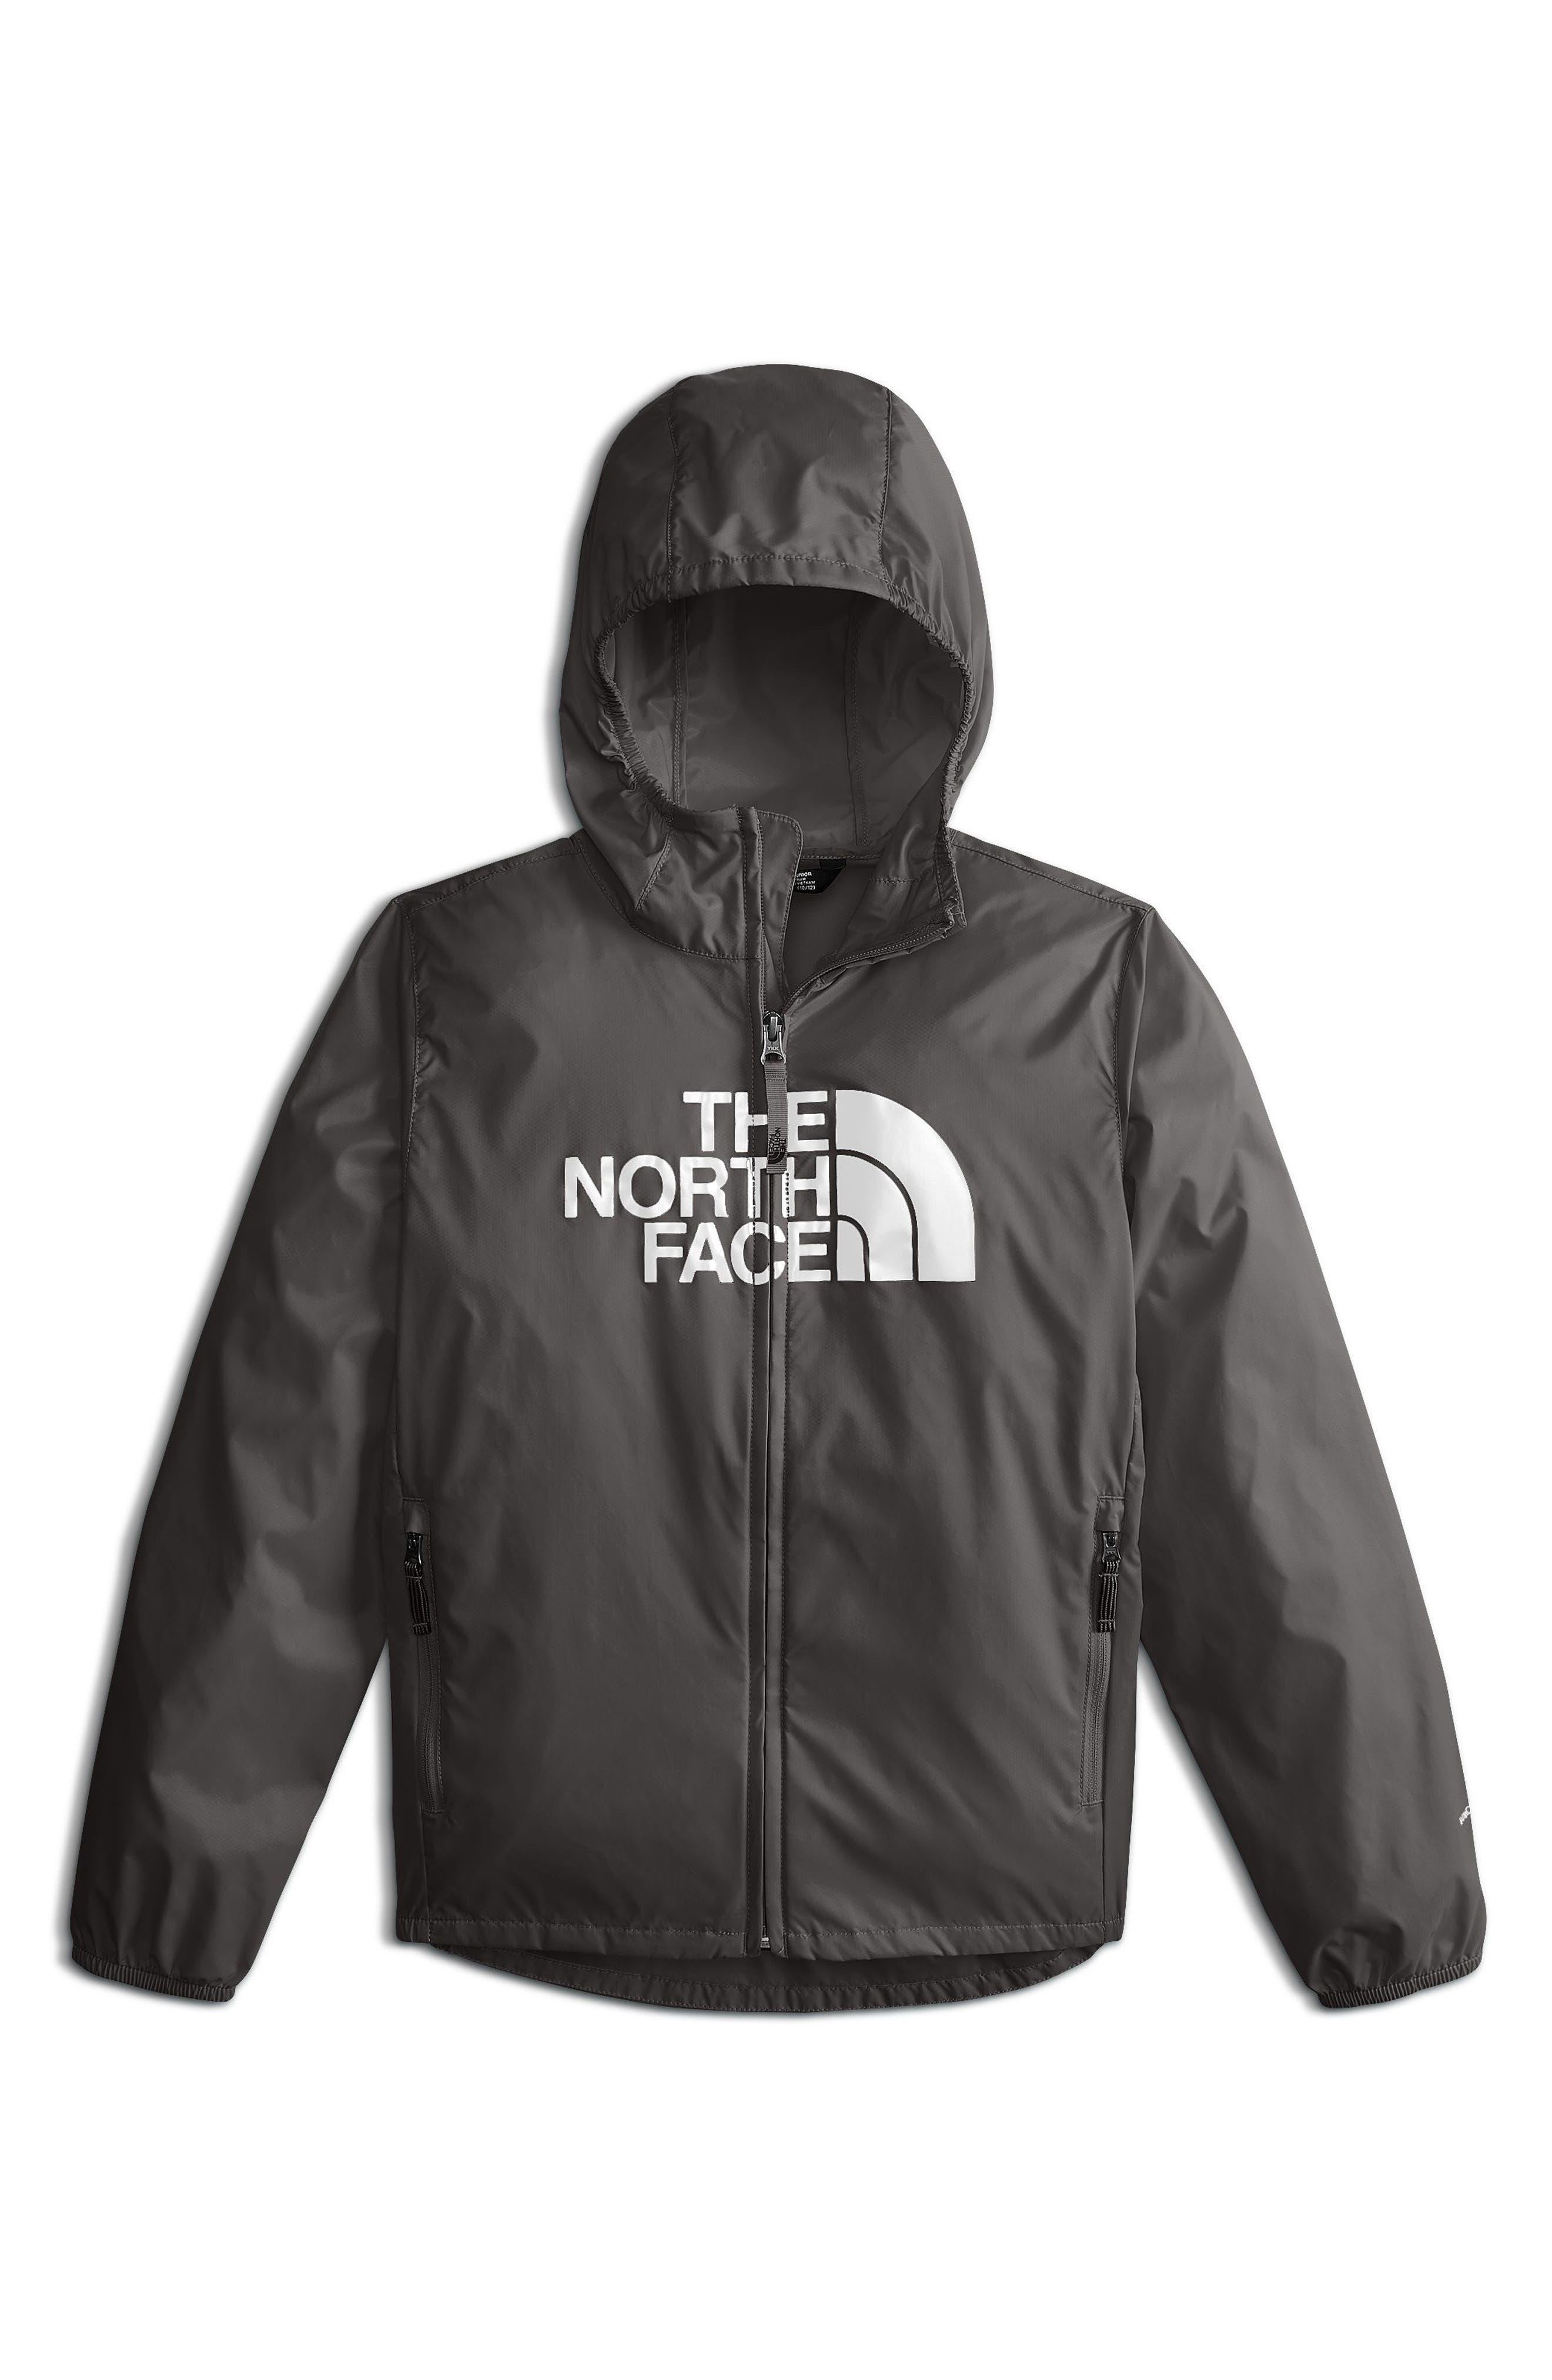 29a2b3569991 Boy s The North Face Flurry Hooded Windbreaker Jacket